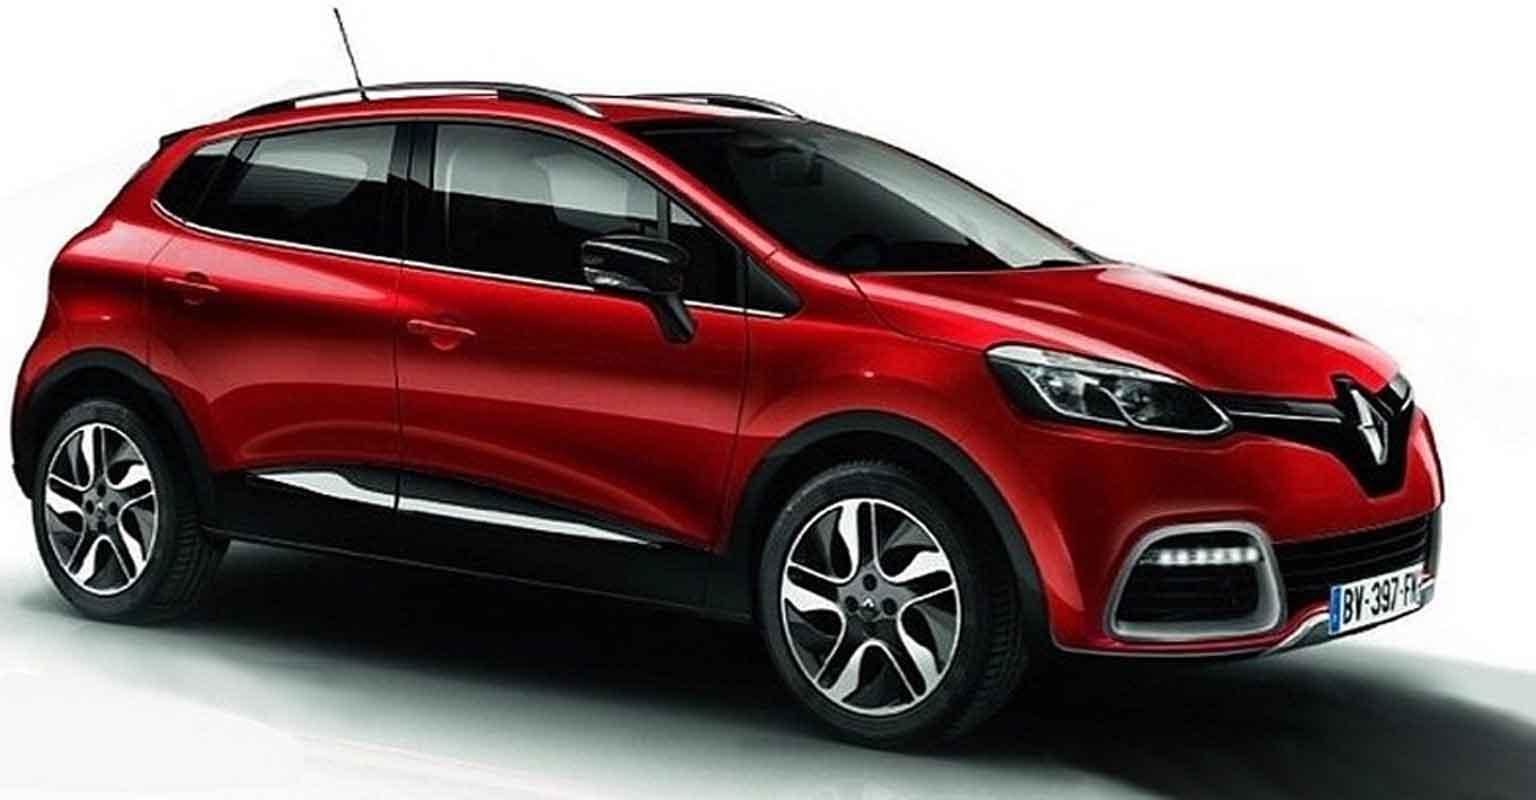 Yeni Renault Captur High Resolution Image Wallpapers Desktop Download